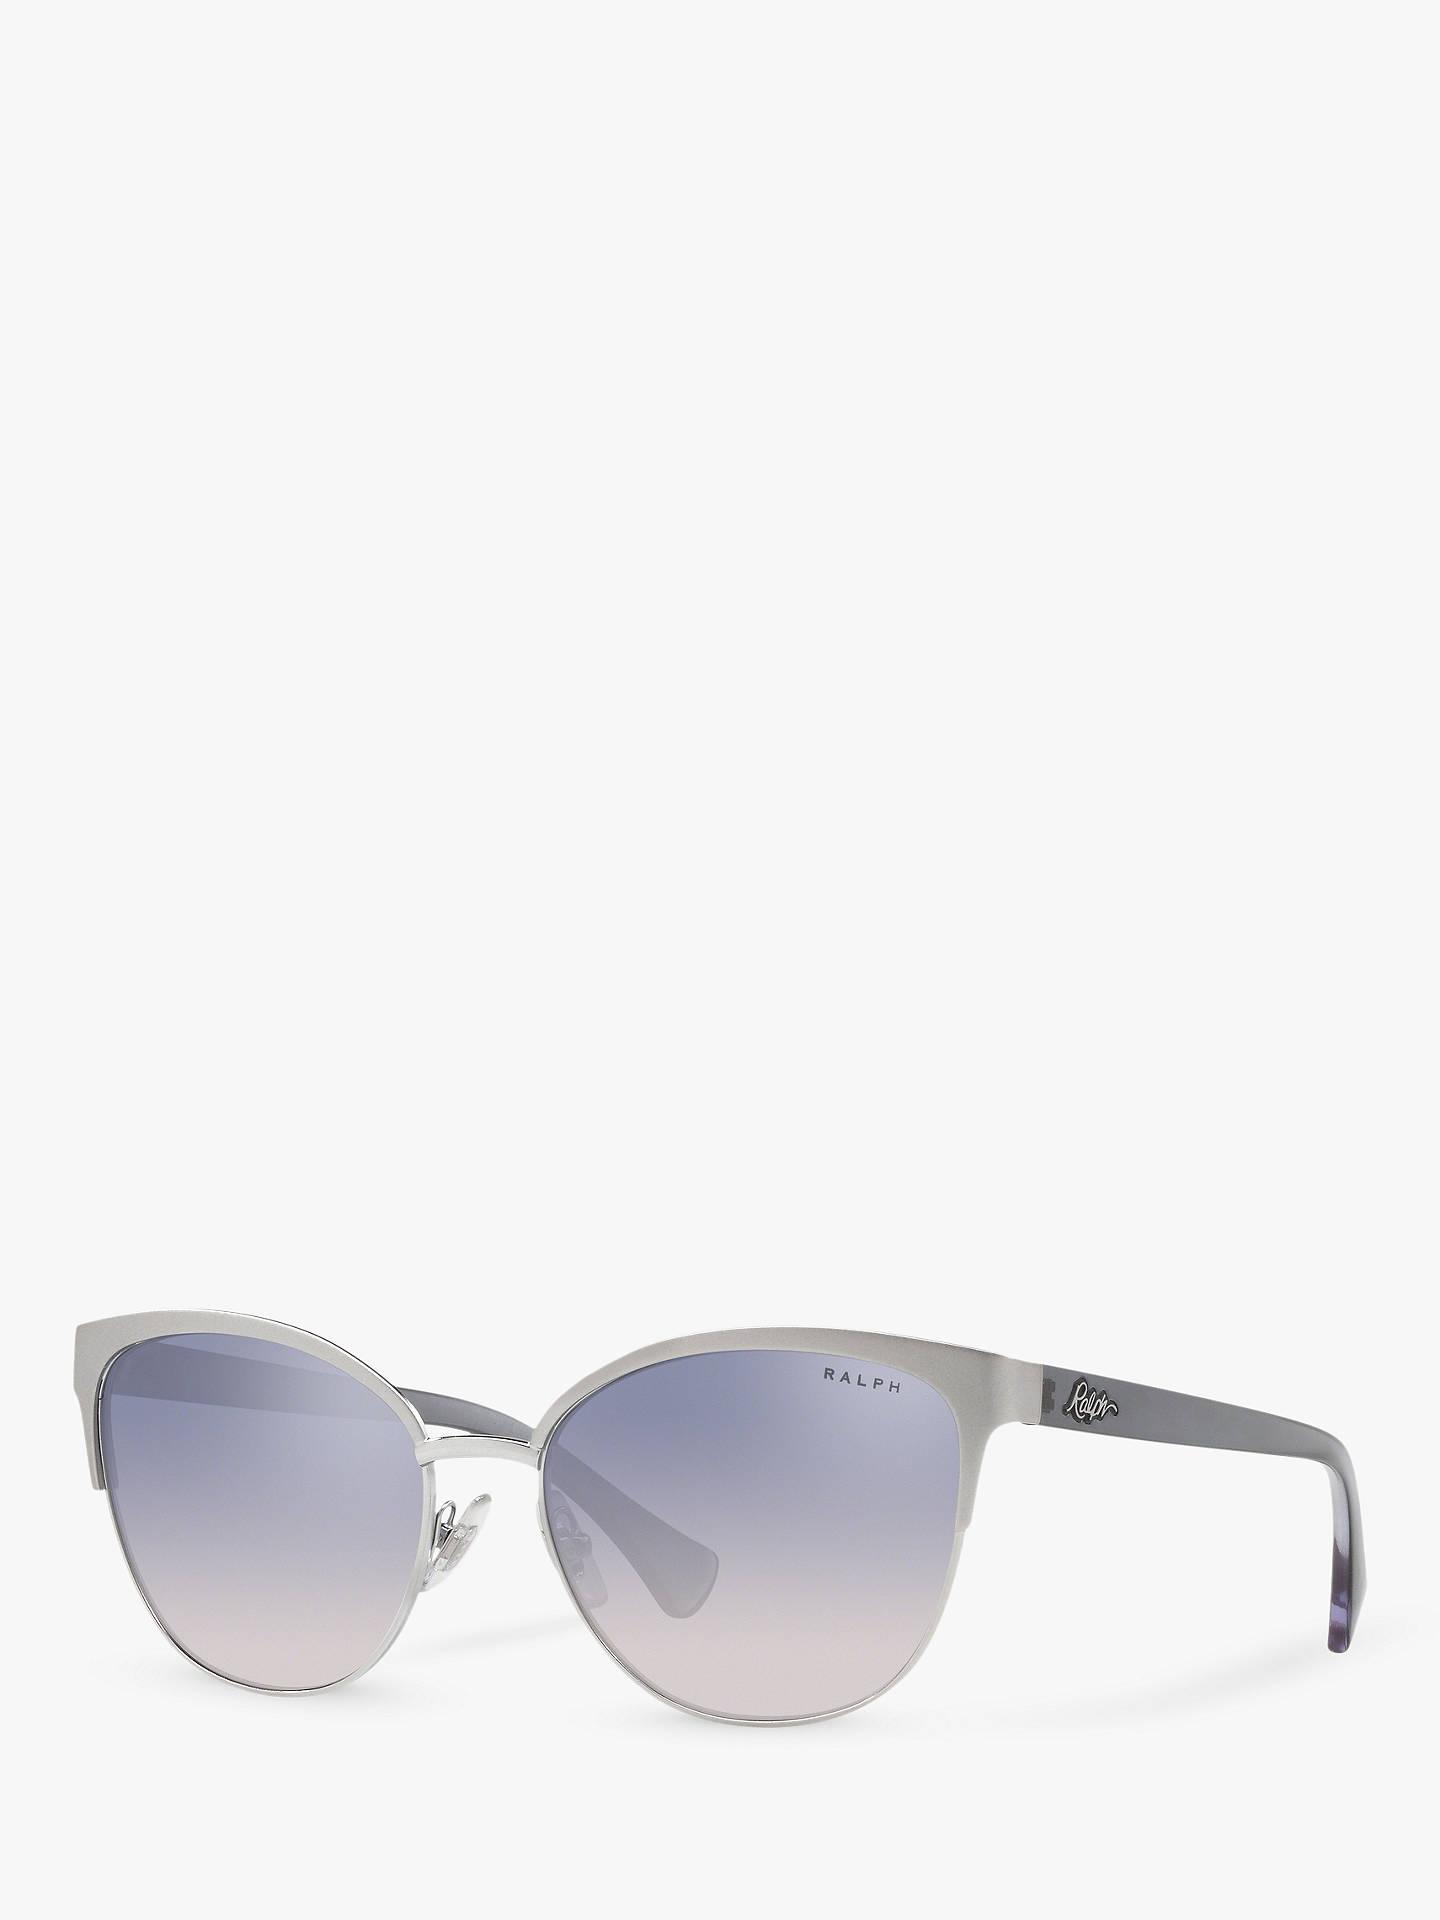 5ad64b374d68 Buy Polo Ralph Lauren RA4127 Women's Butterfly Sunglasses, Silver/Blue  Gradient Online at johnlewis ...